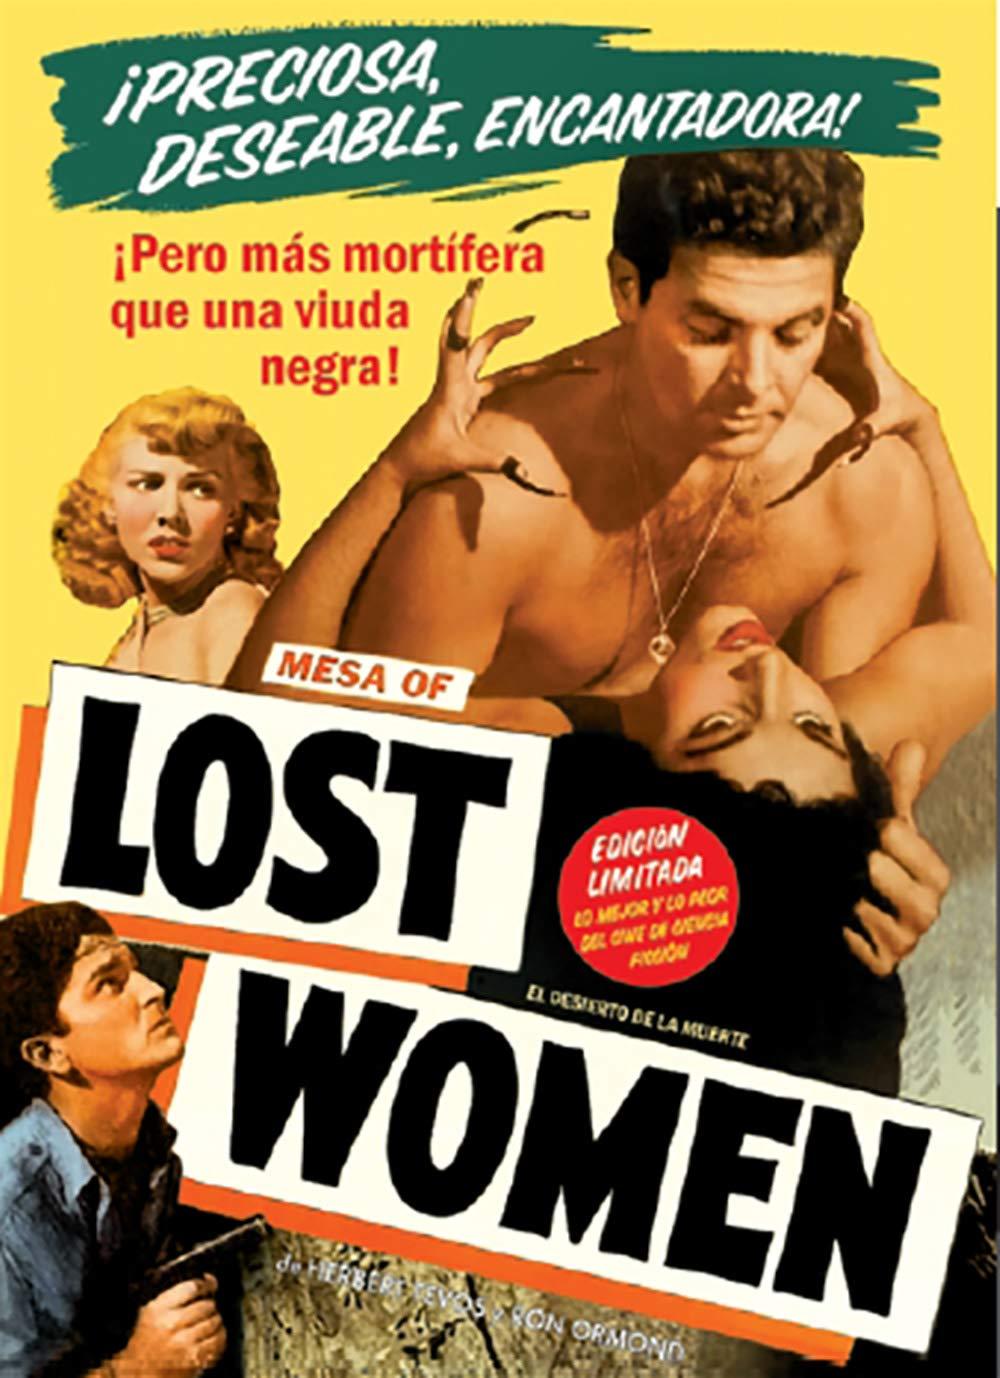 Mesa New products, world's highest quality popular! Of Lost Women Discount is also underway El Desierto Muerte De La